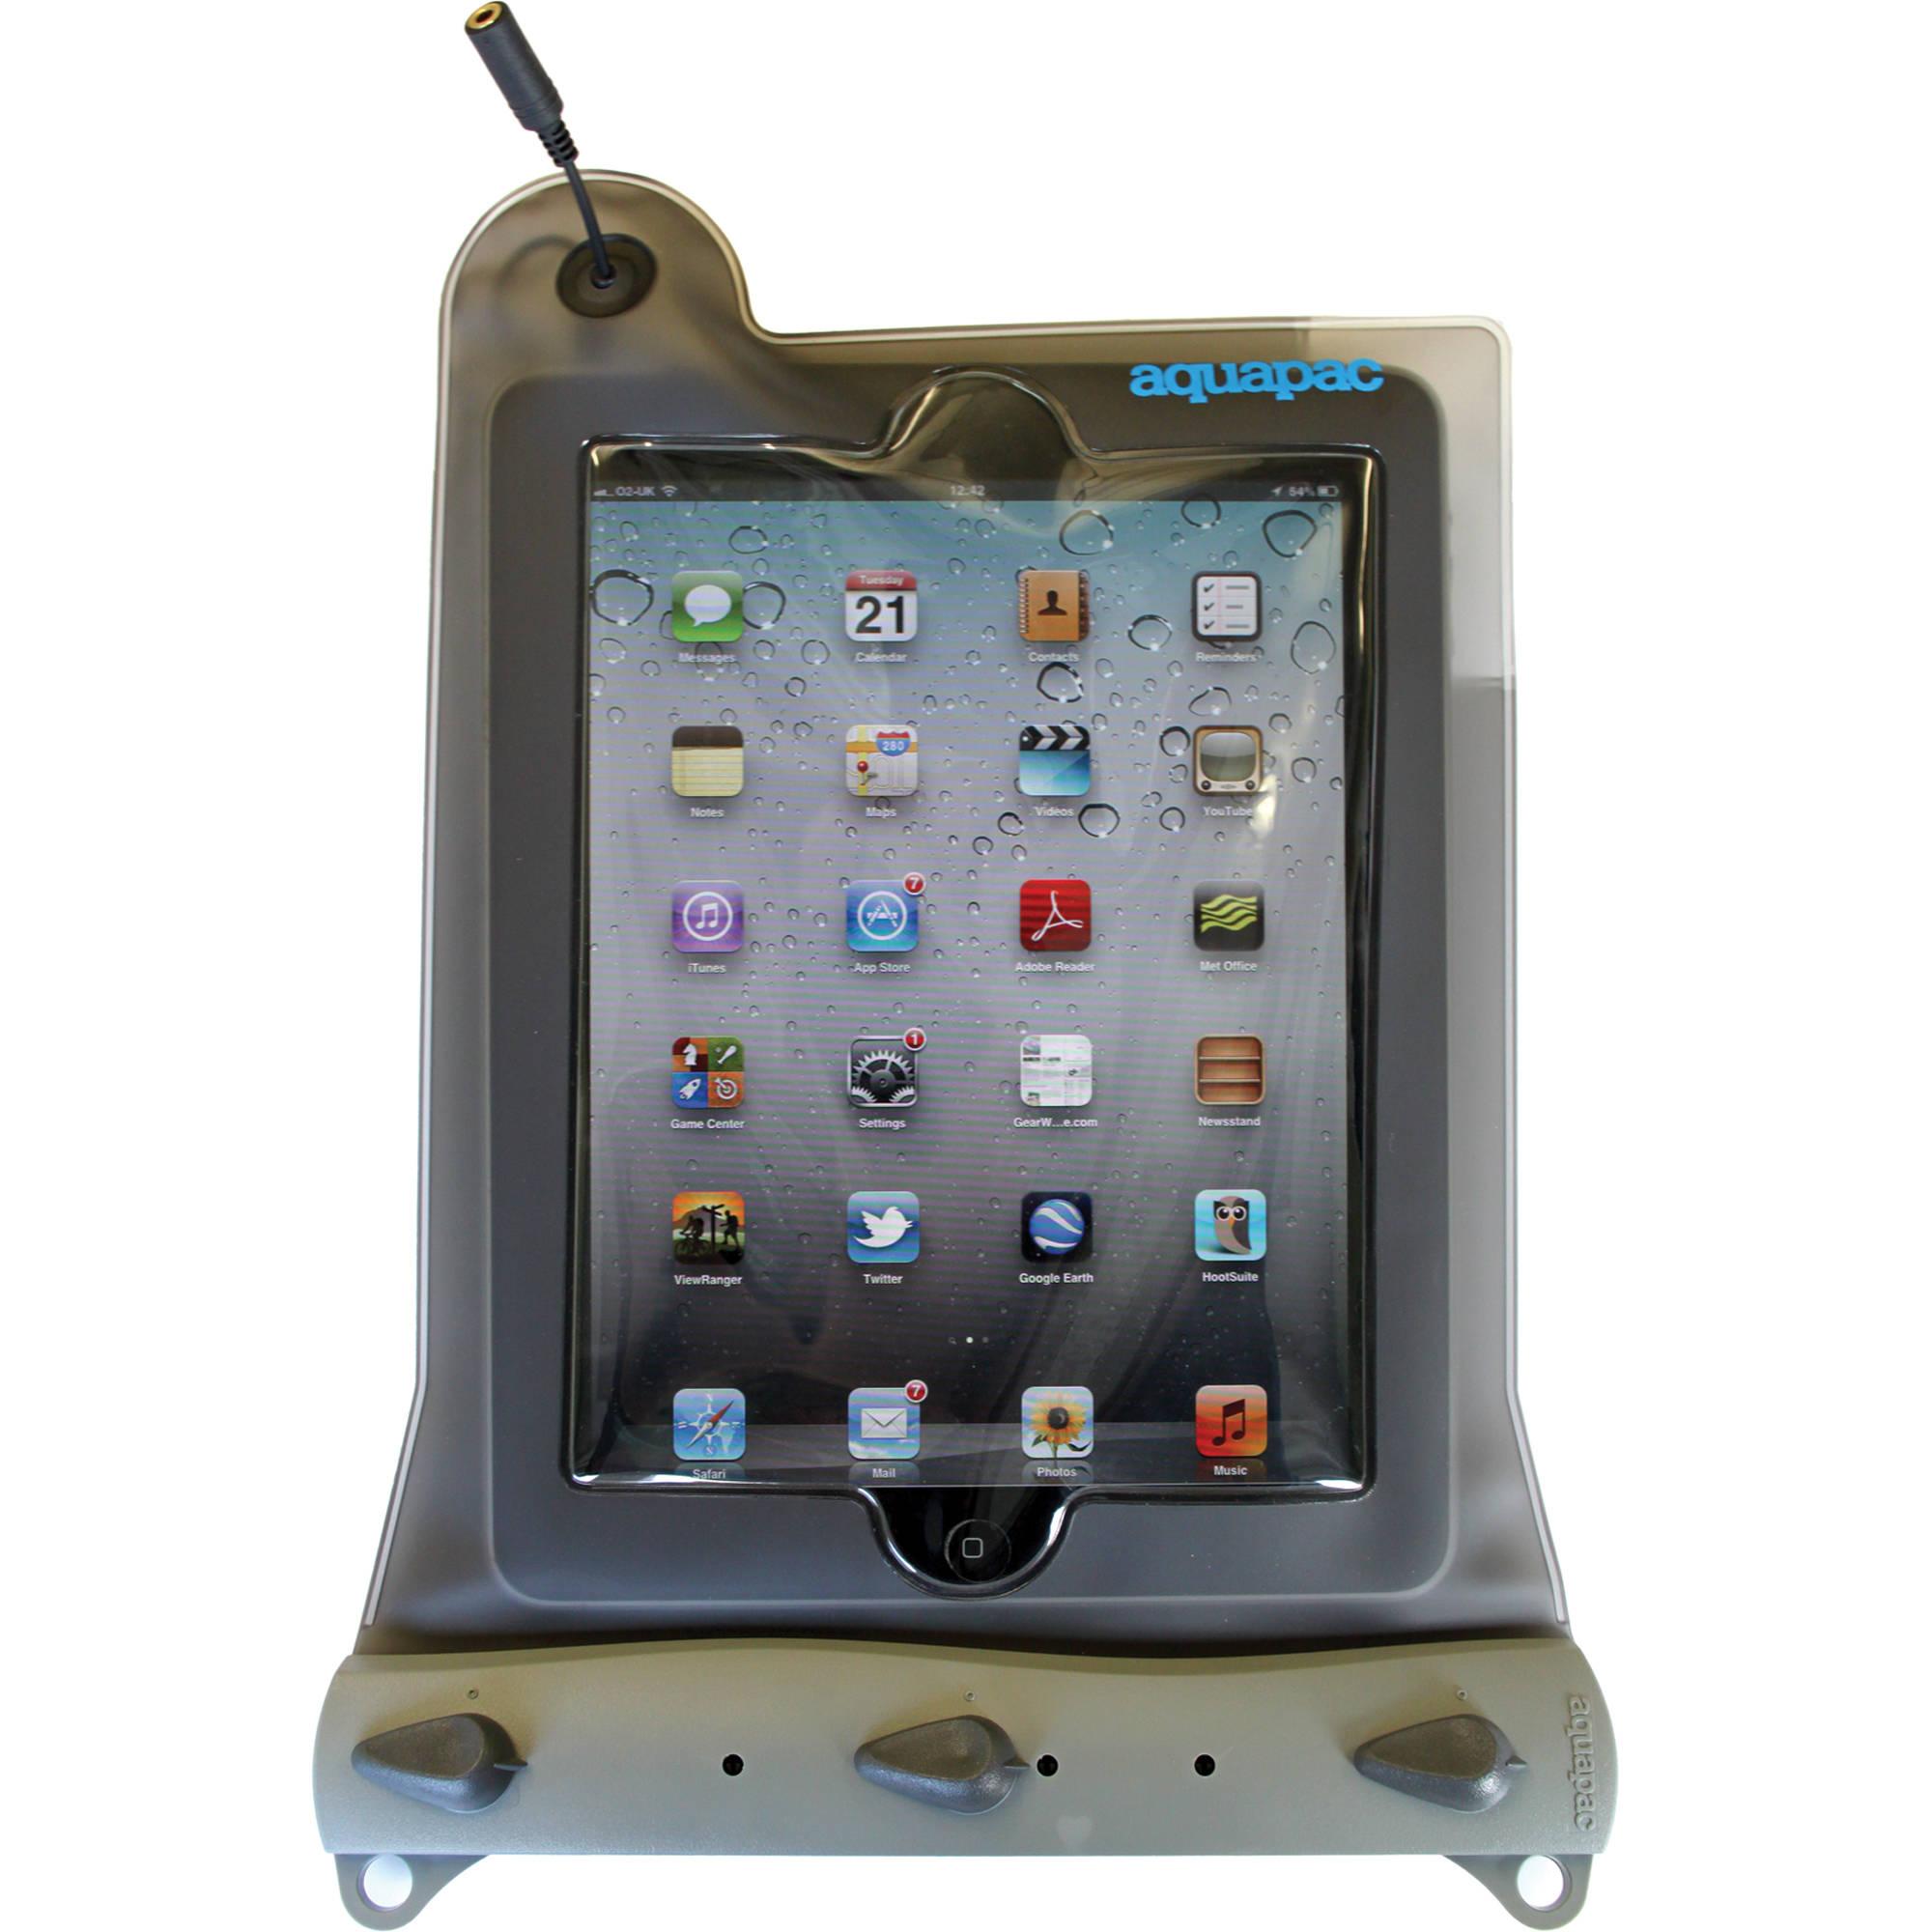 Aquapac Waterproof Case for iPad (Cool Gray)